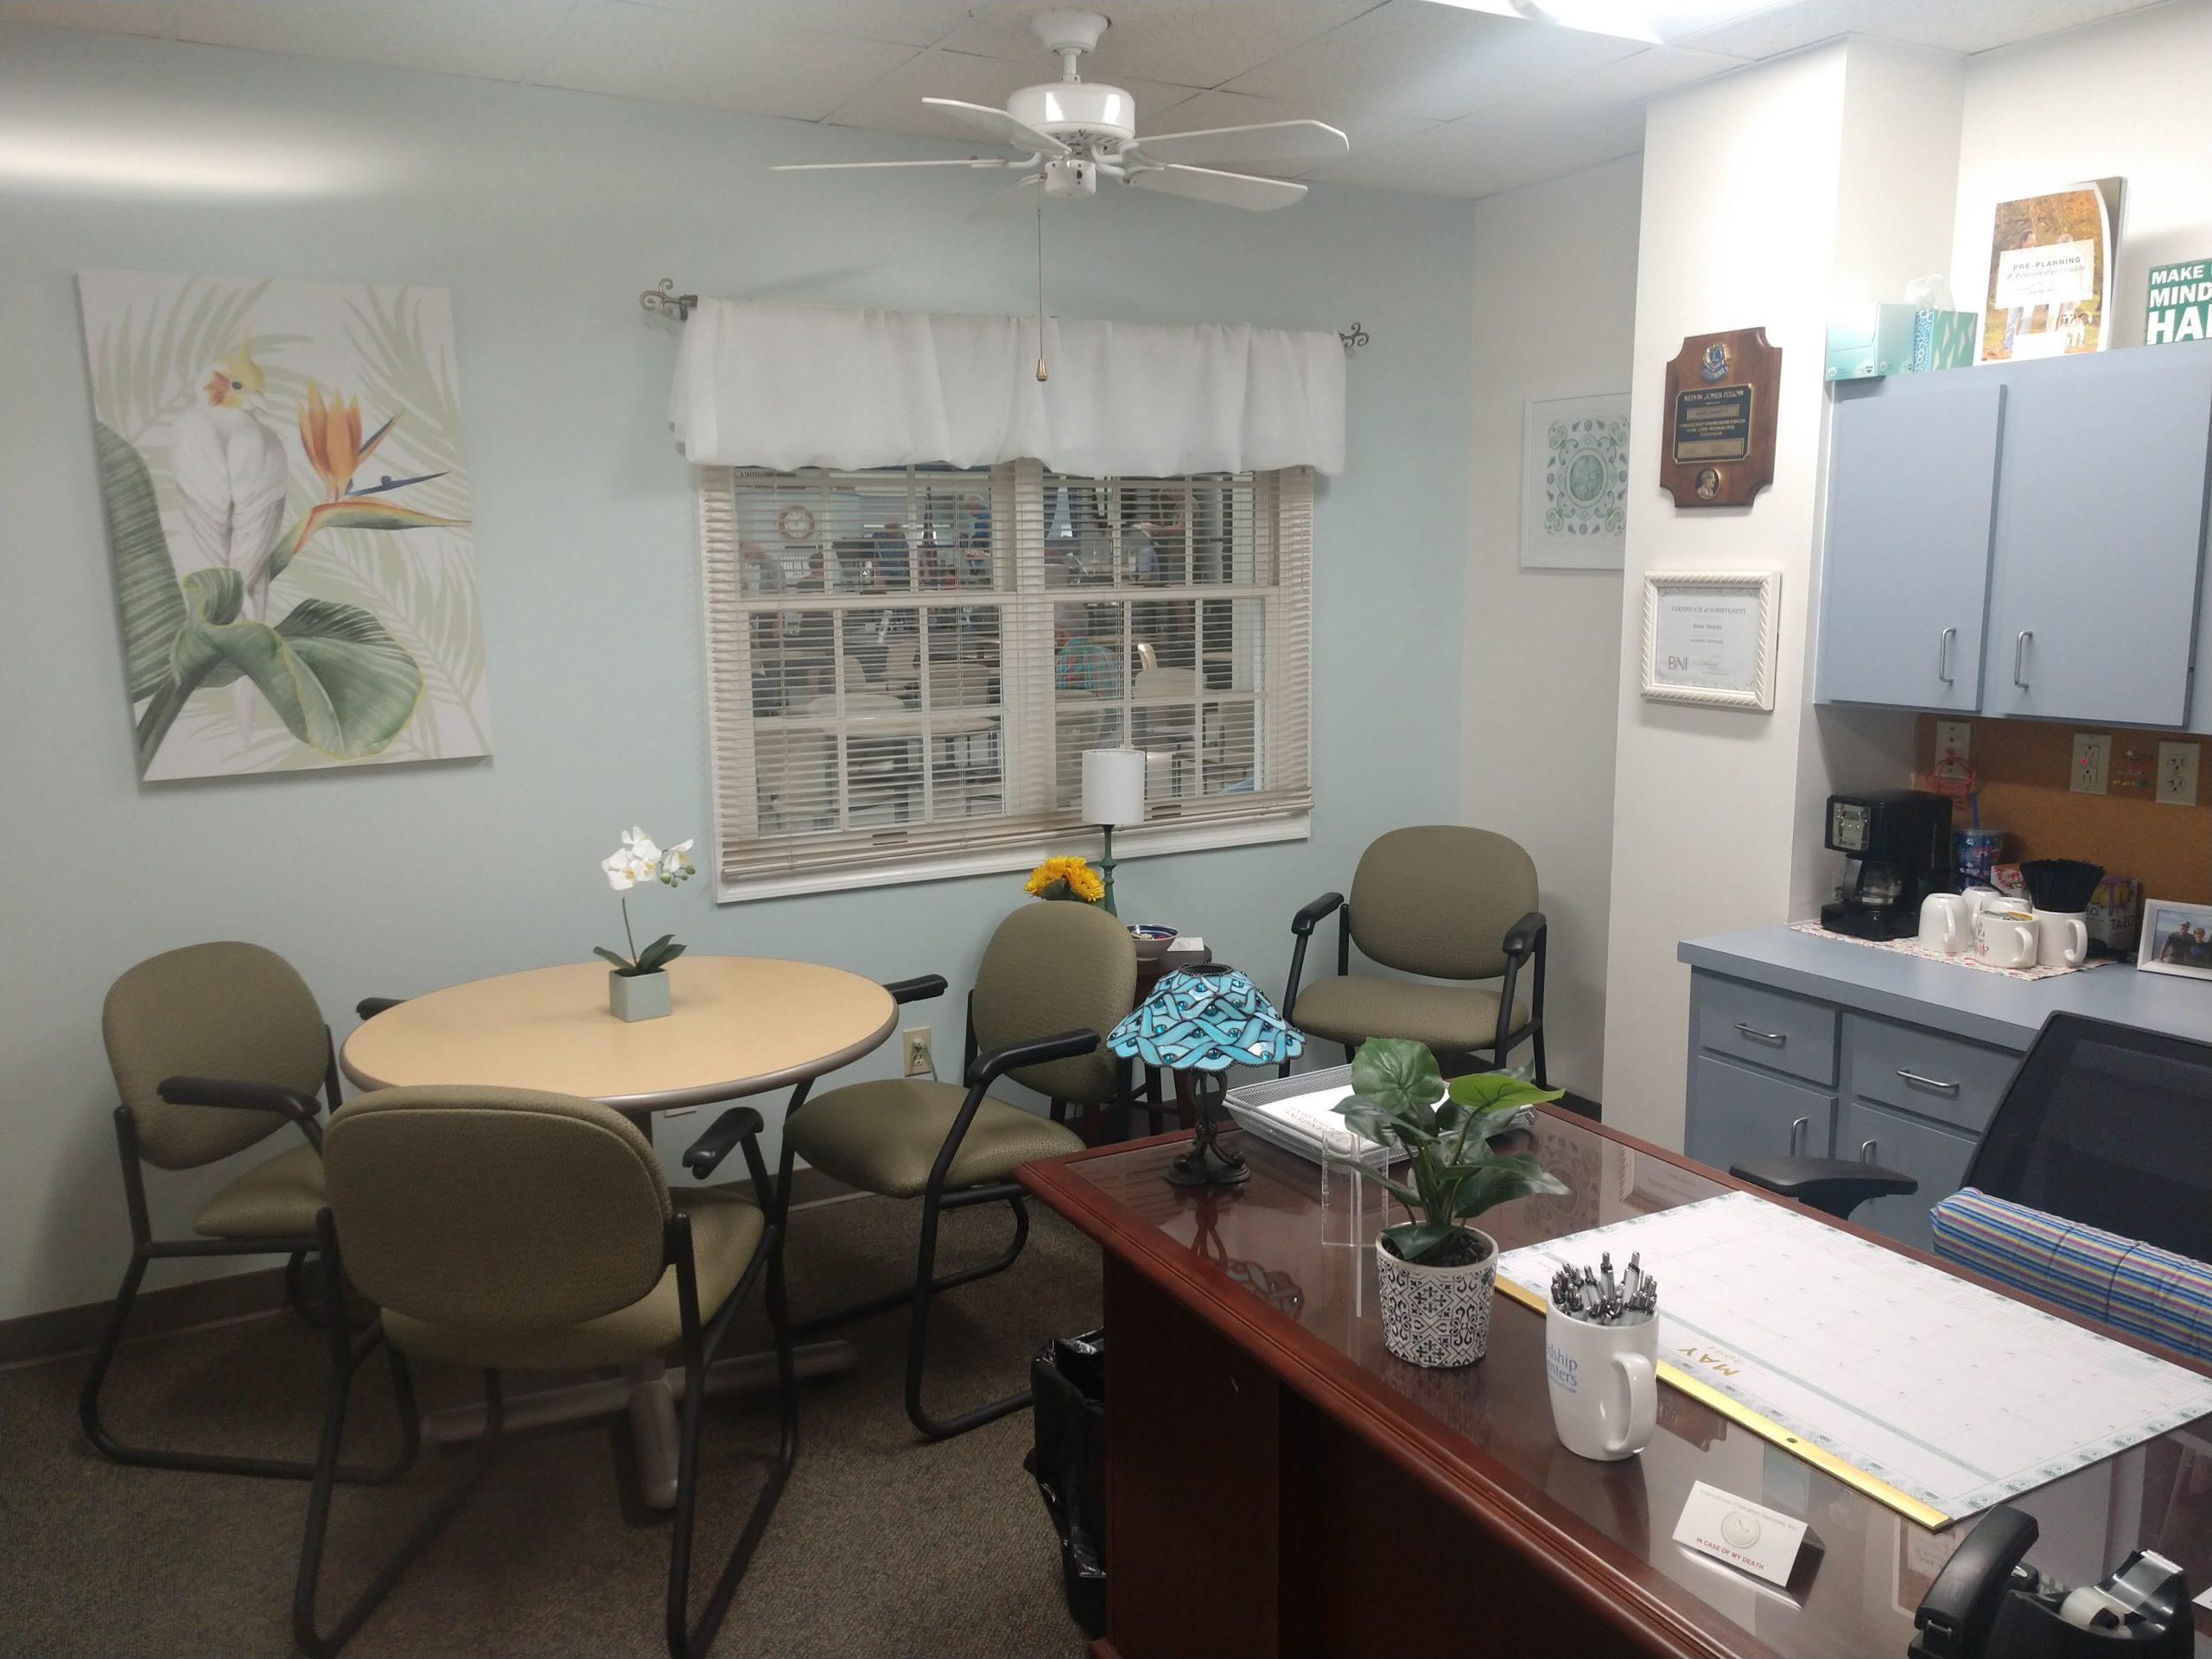 Coastal Cremations Florida - Sarasota Arrangement Office Located Inside the Senior Center